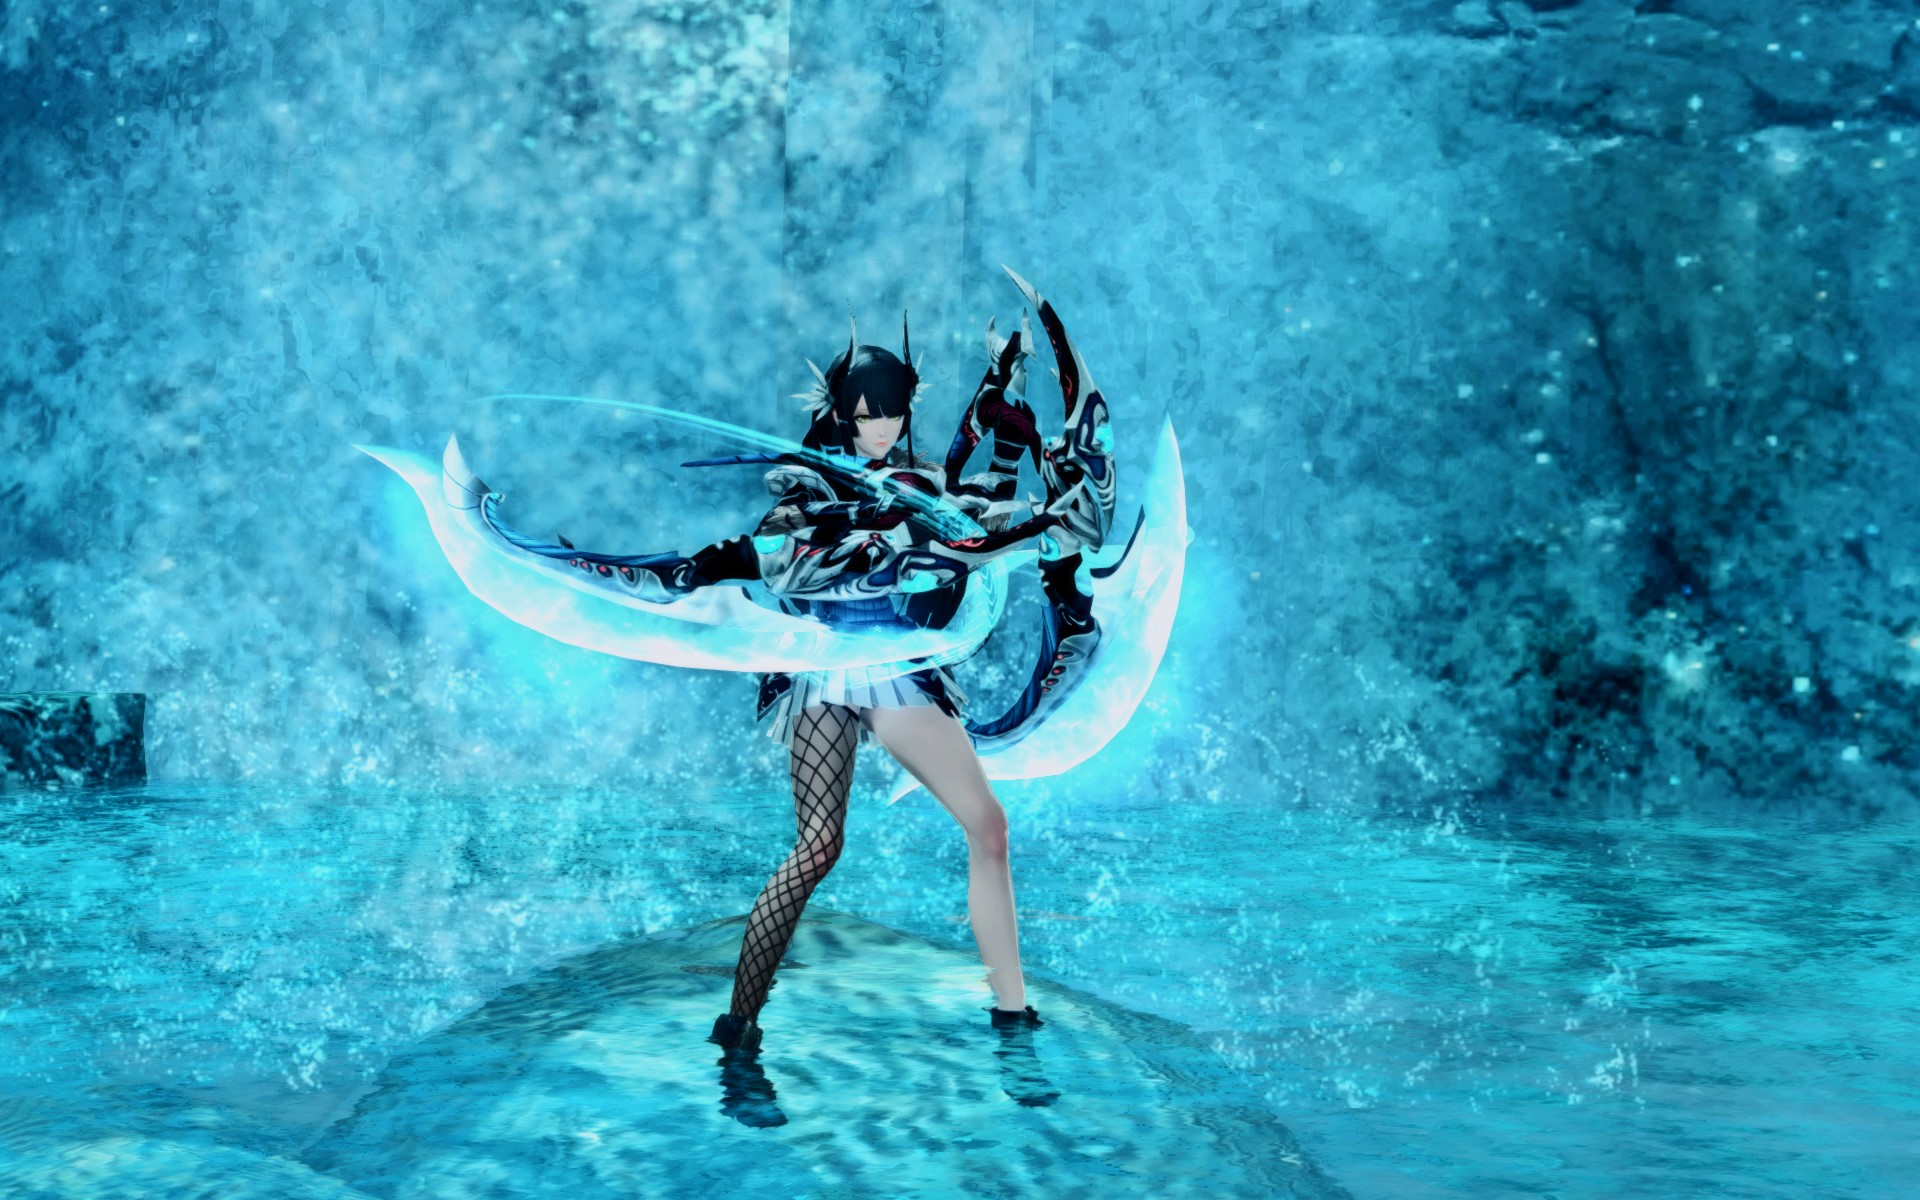 PSO2 Phantasy Star Online 2 MMORPG Sega Atlas Relic EX Weapon Camo